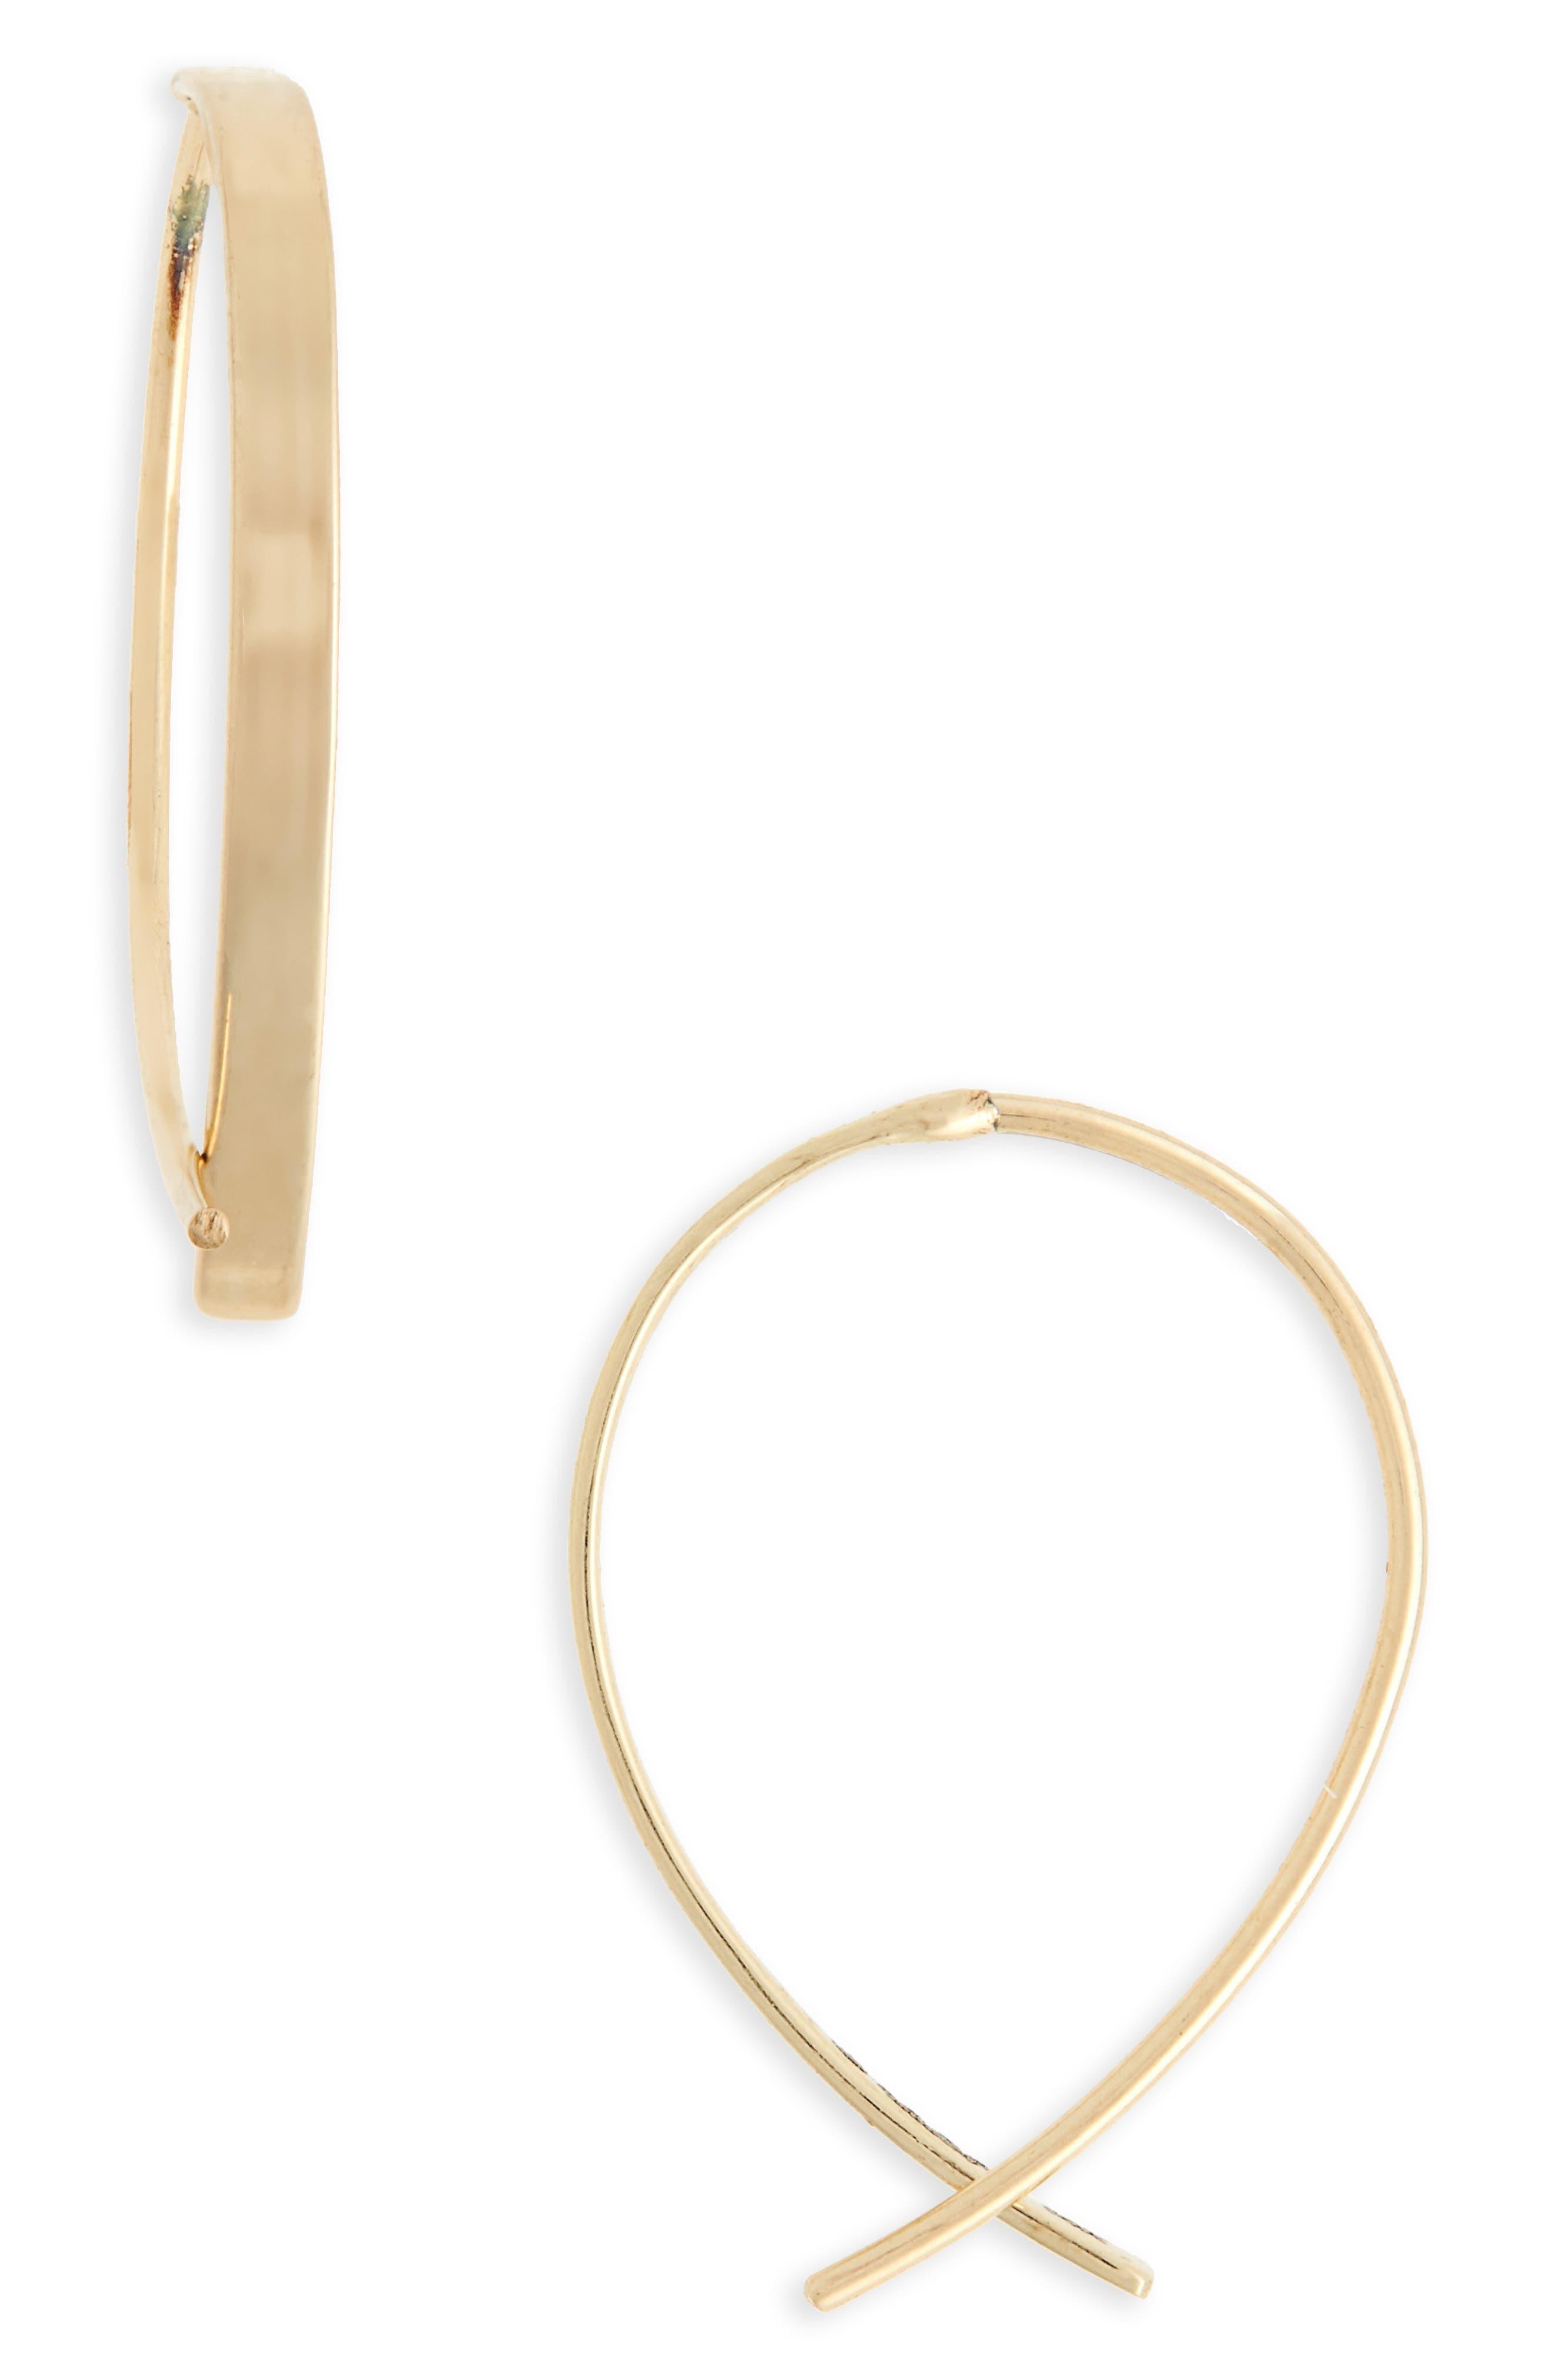 Main Image - Lana Girl by Lana Jewelry Upside Down Hoops (Girls)